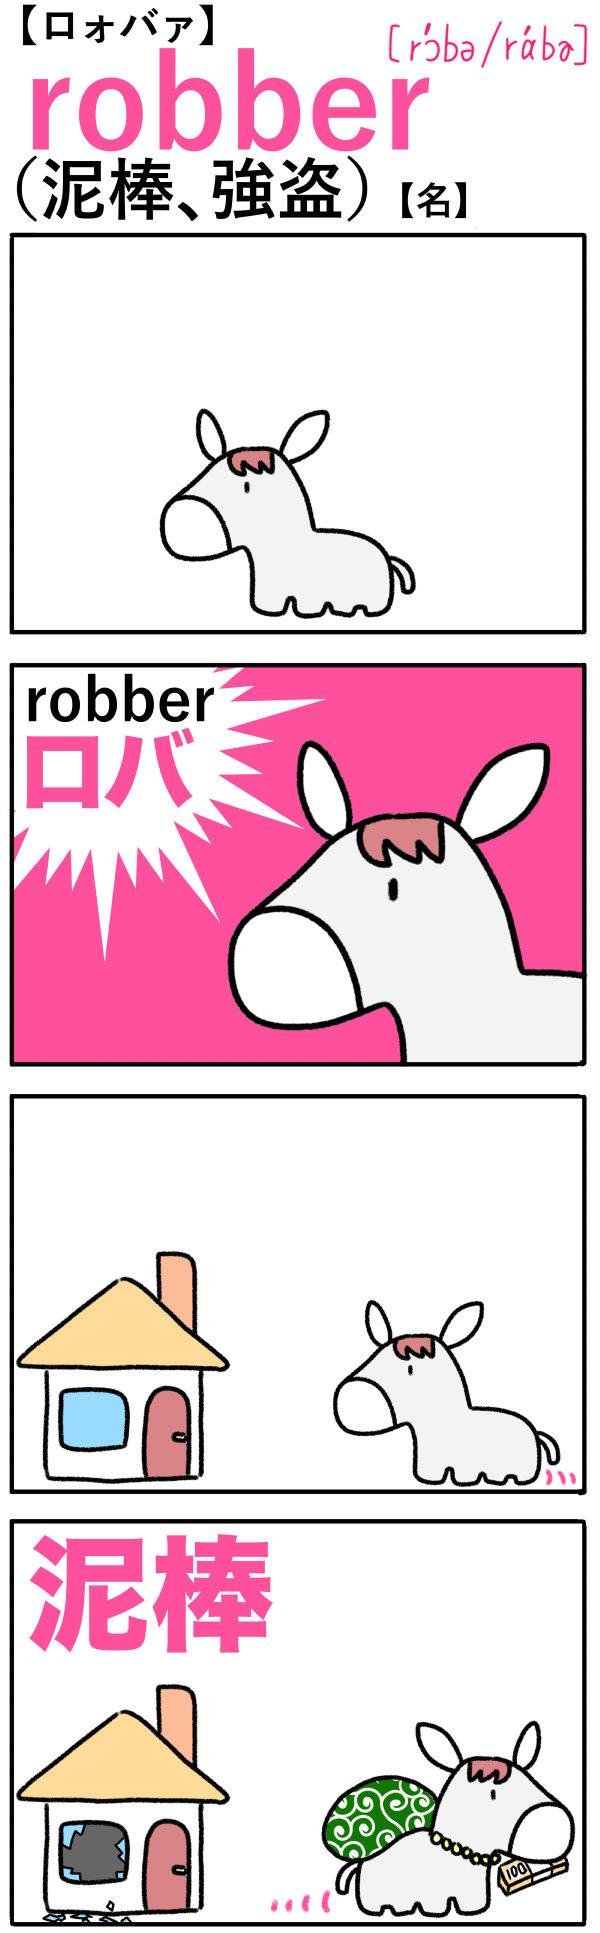 robber(泥棒、強盗)の語呂合わせ英単語